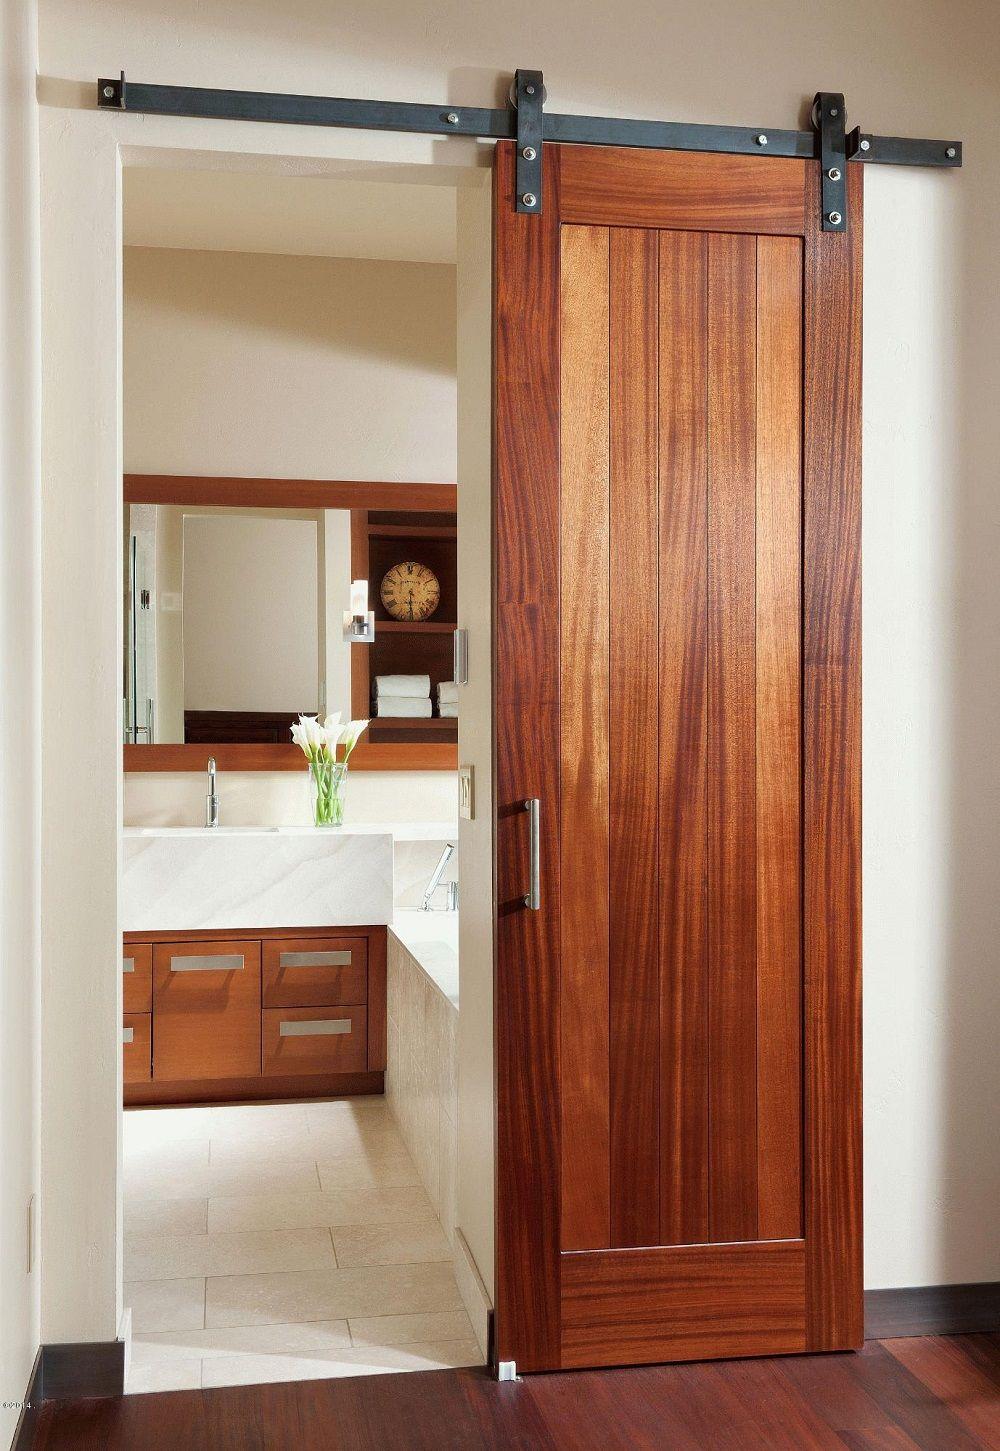 Asian Inspired   Bathroom Ideas   Rustic Style   Barn Door   Modern  Industrial Http: